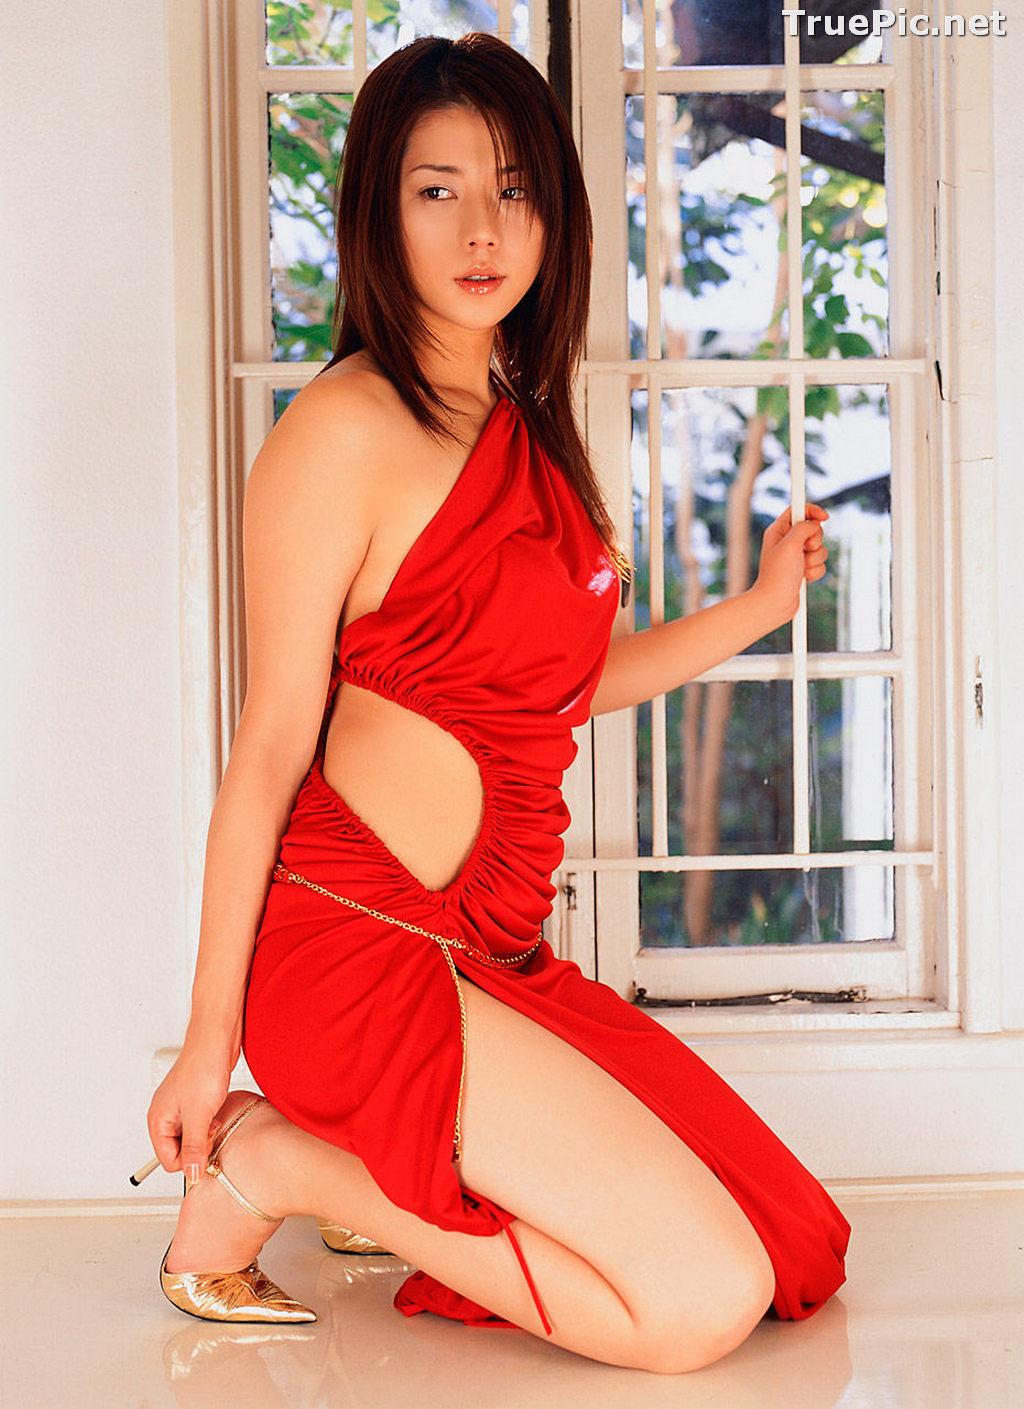 Image Japanese Tarento and Gravure Idol - Miho Yoshioka - Secret Colors Photo - TruePic.net - Picture-6